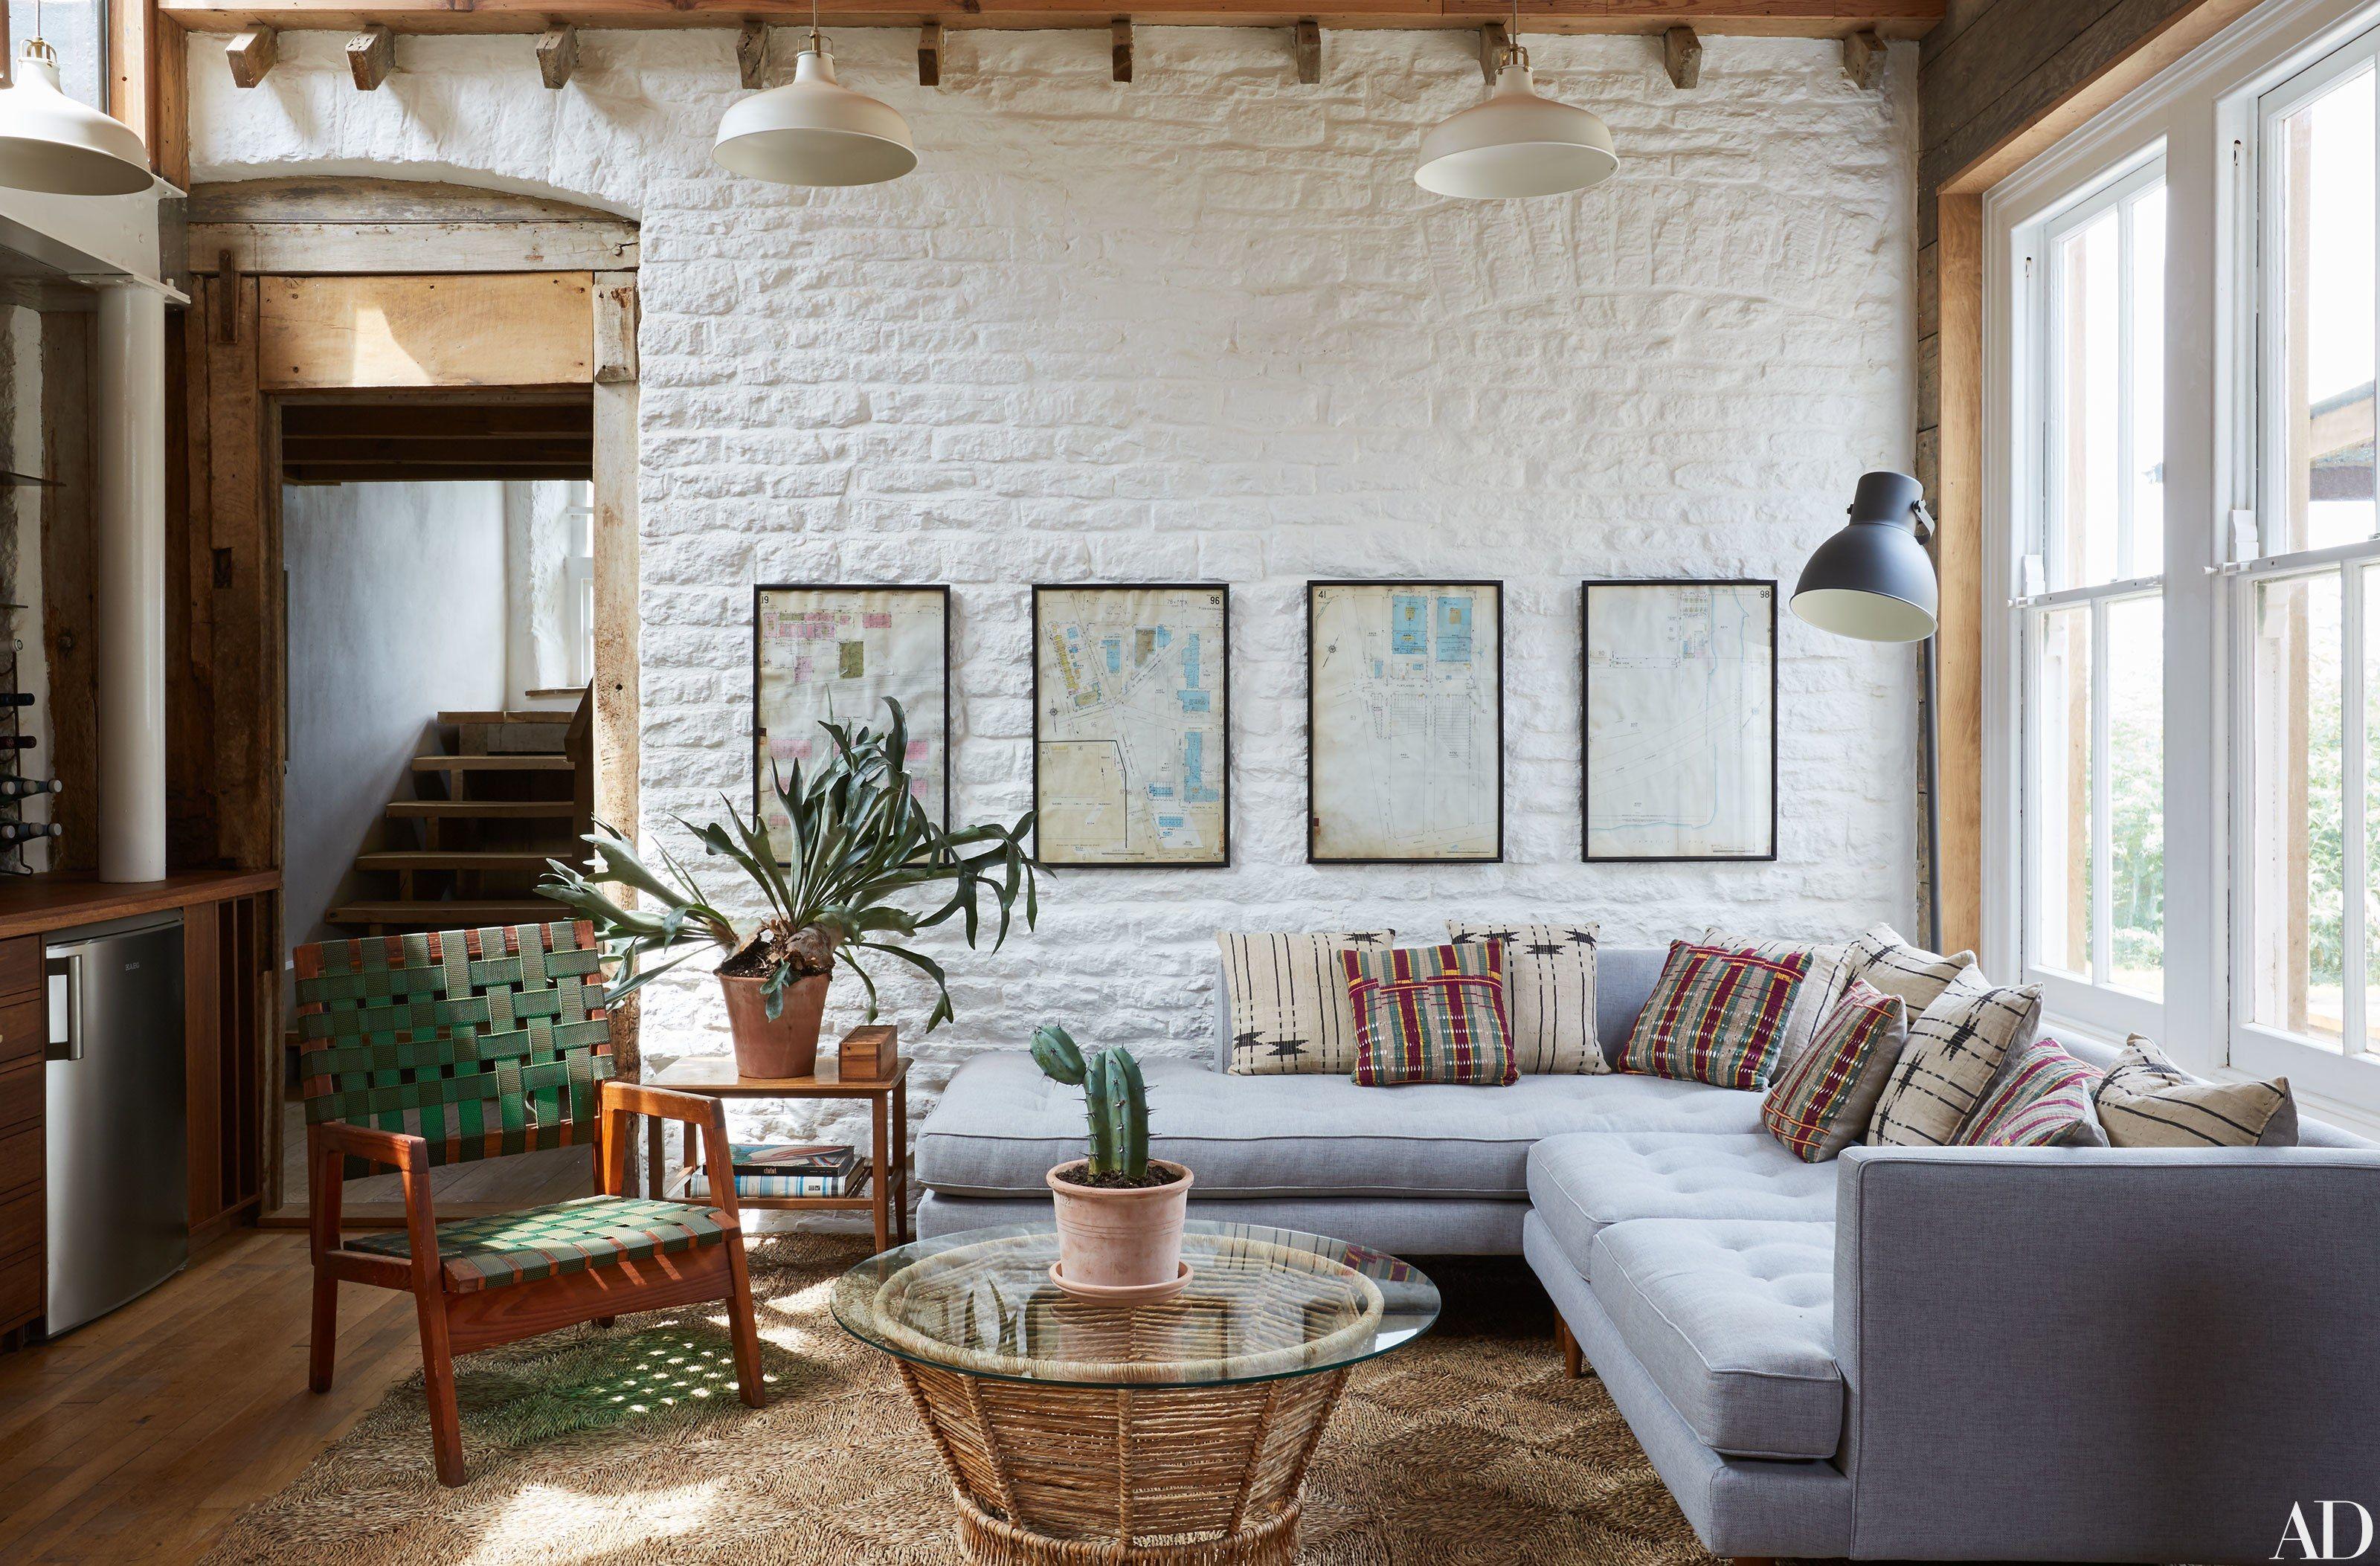 Amanda Brooks Invites Us Inside Her Dreamy English Country Home ...